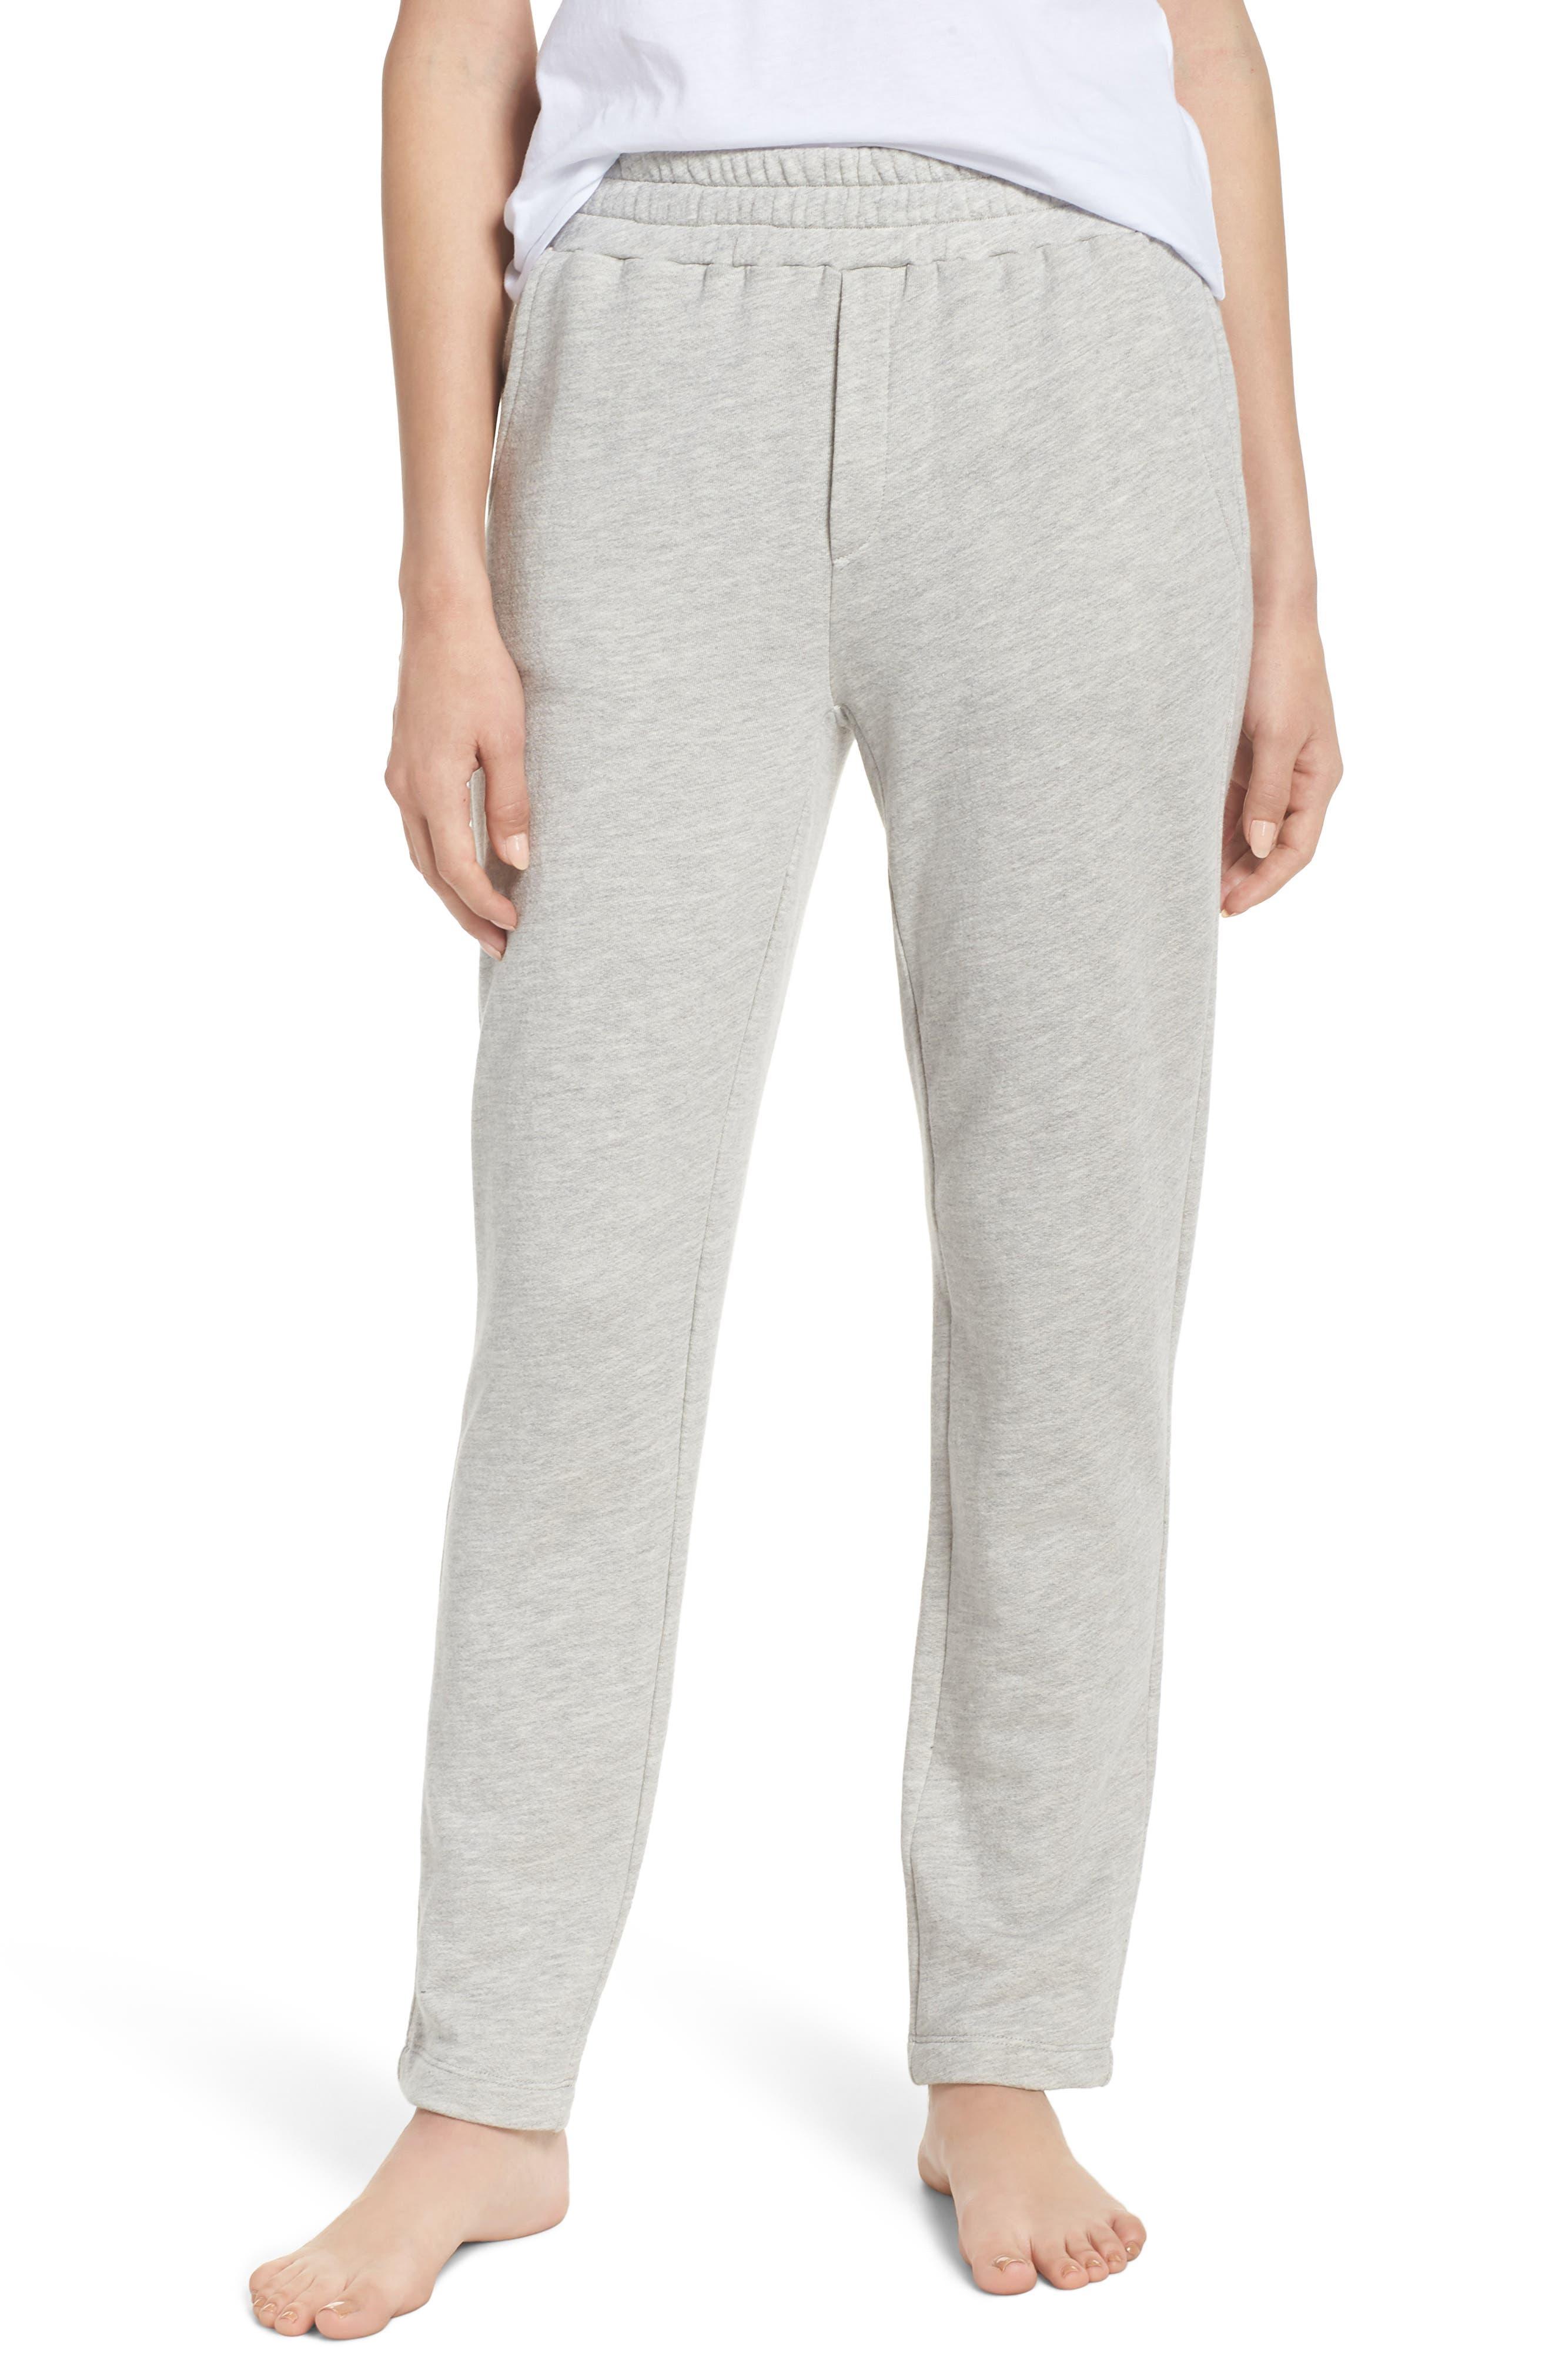 Terry Pajama Pants,                             Main thumbnail 1, color,                             Grey Terry